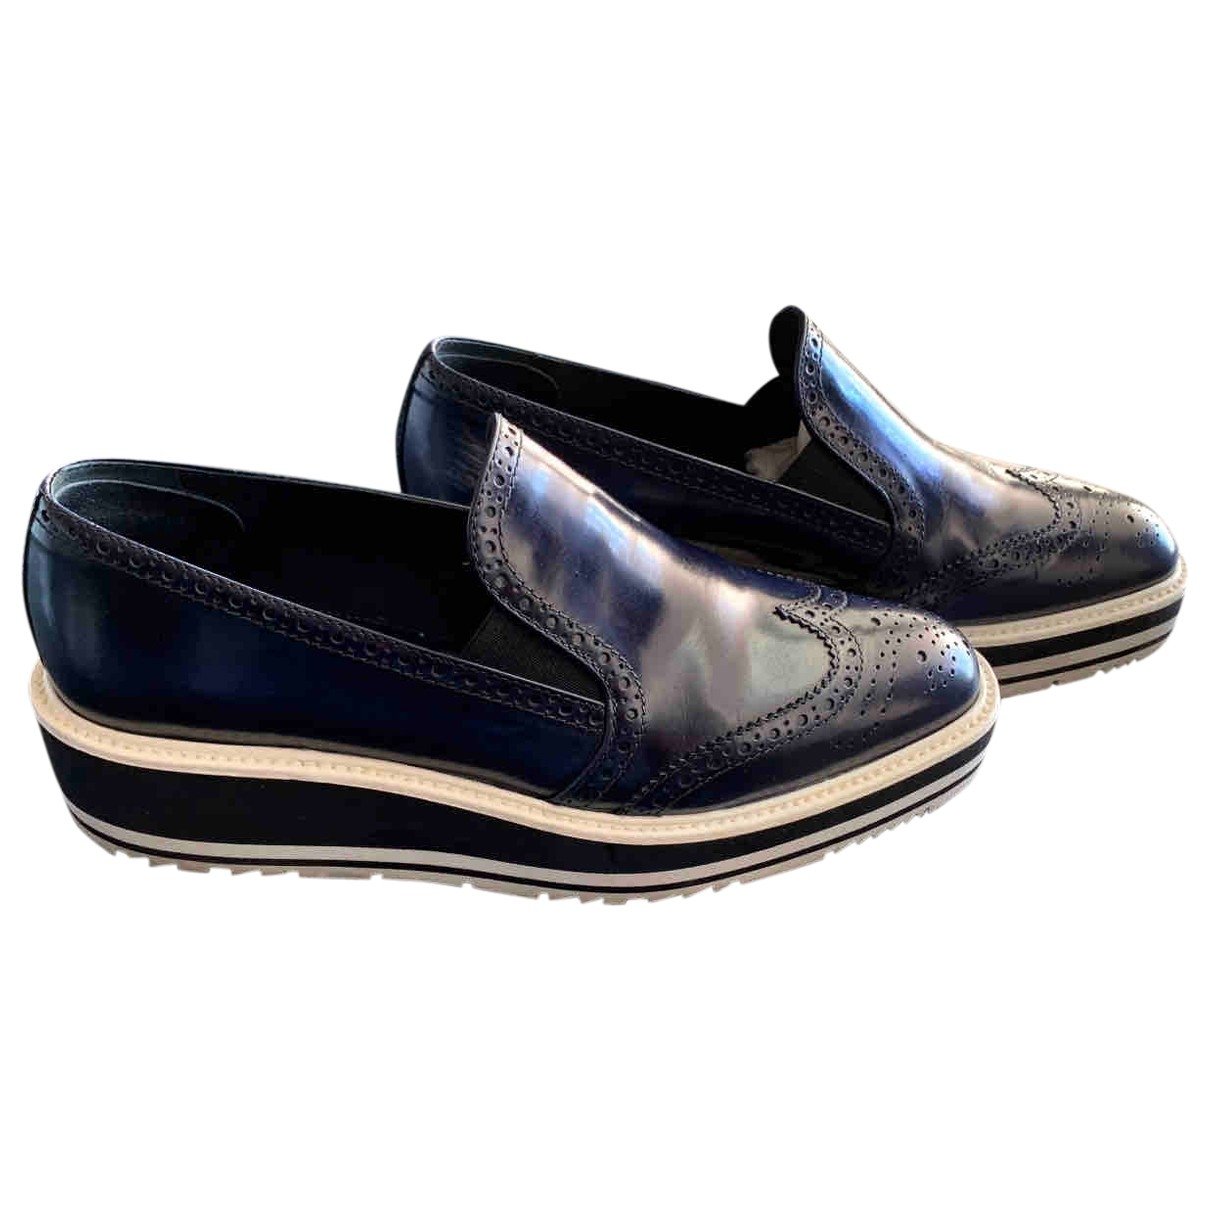 Prada \N Blue Leather Trainers for Women 38 EU